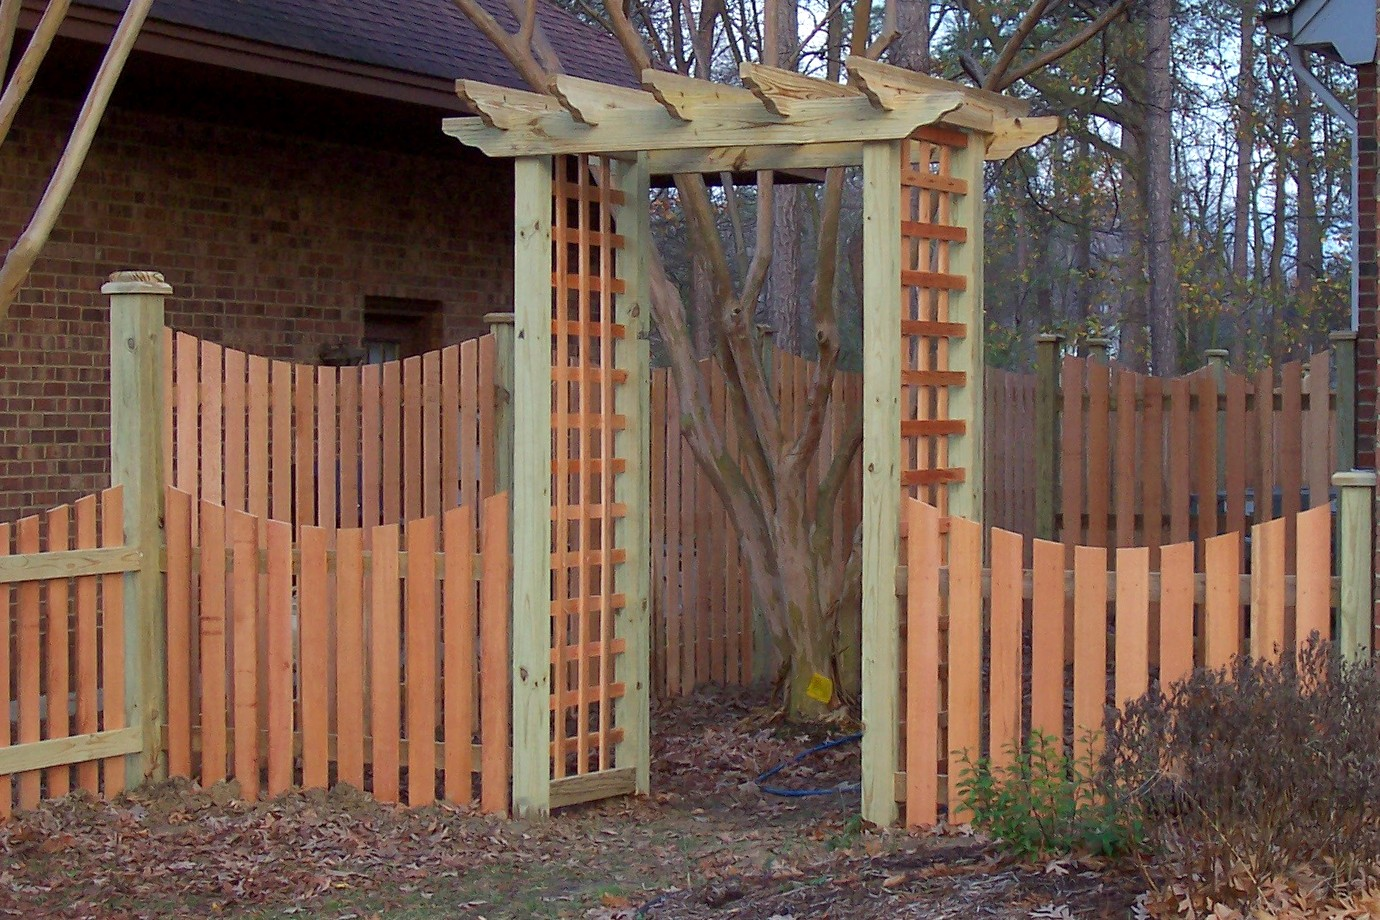 No fences make good neighbors / Berkeley residents combine their